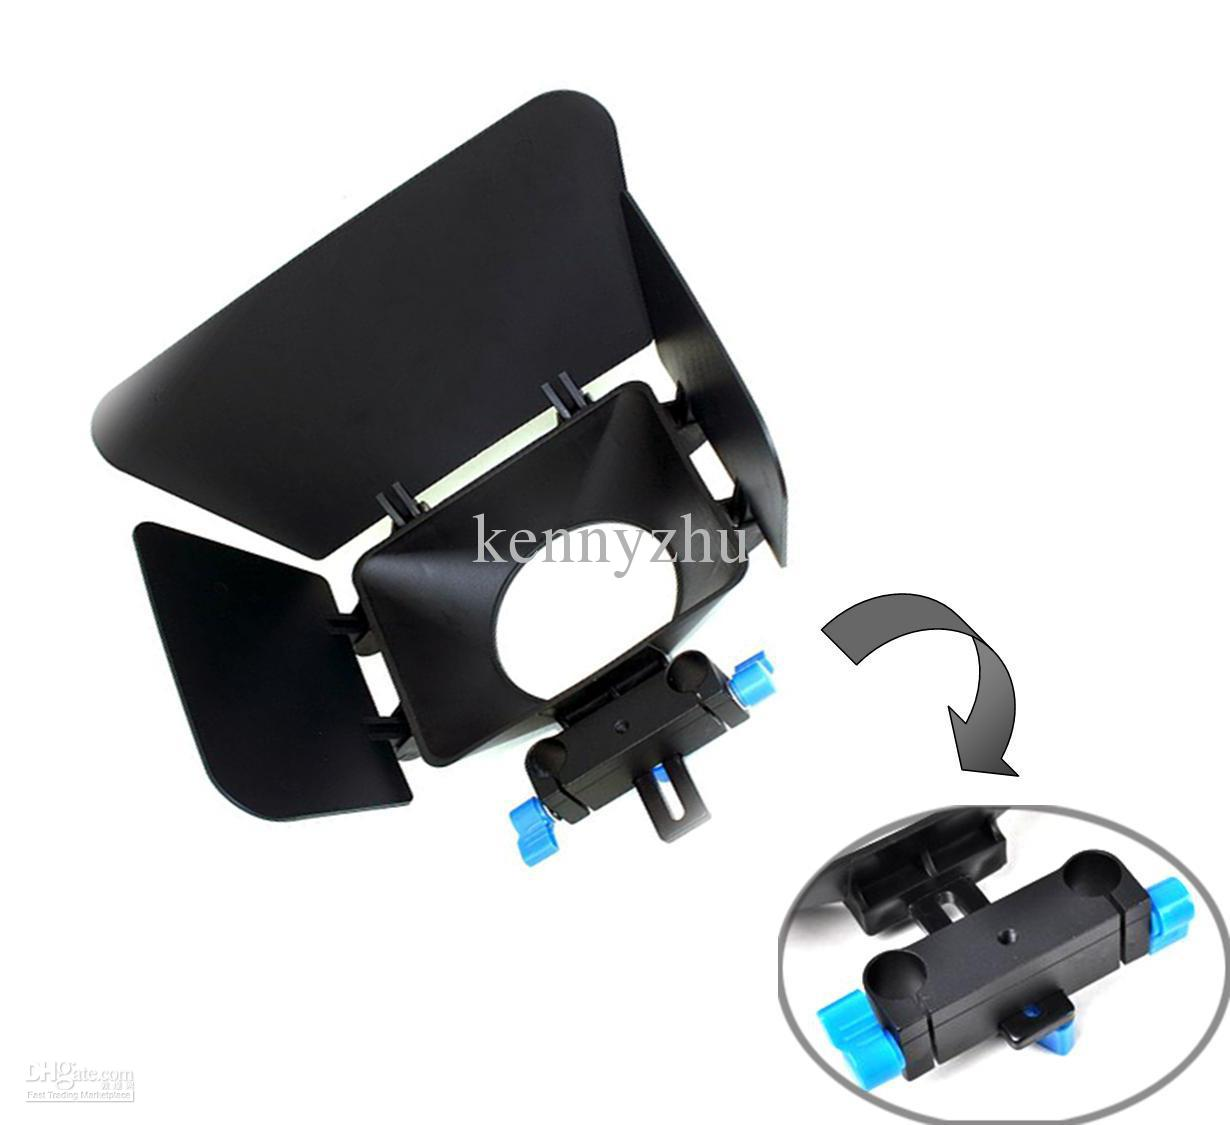 DSLR Movie Kit Matte Box sistema di supporto asta guida 15mm Videocamere 7D 5D MARK II 60D 600D D90